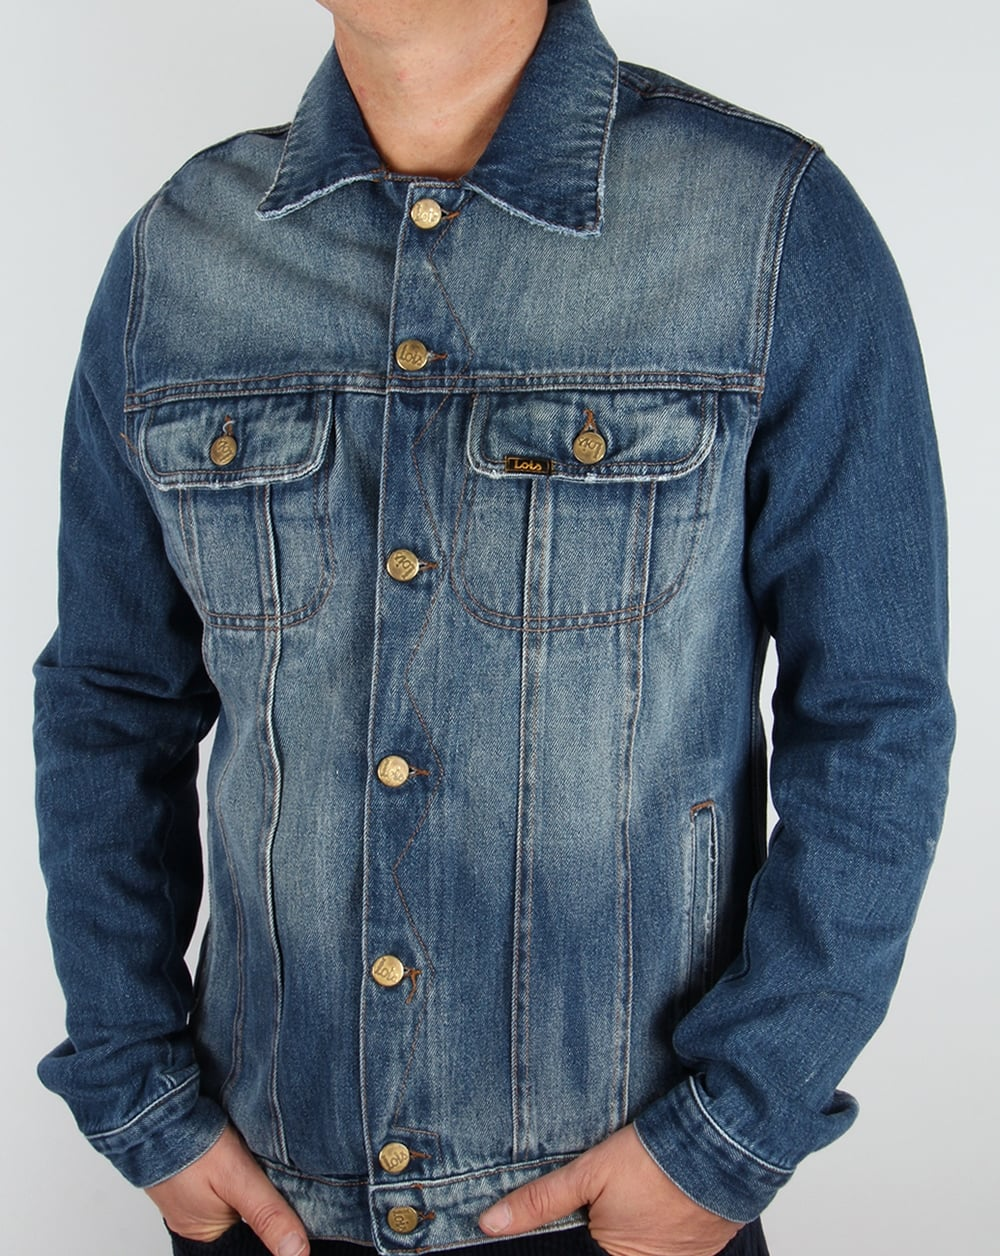 Lois Tejana Denim Jacket Stone Wash,coat,jean,blue,mens - photo#16